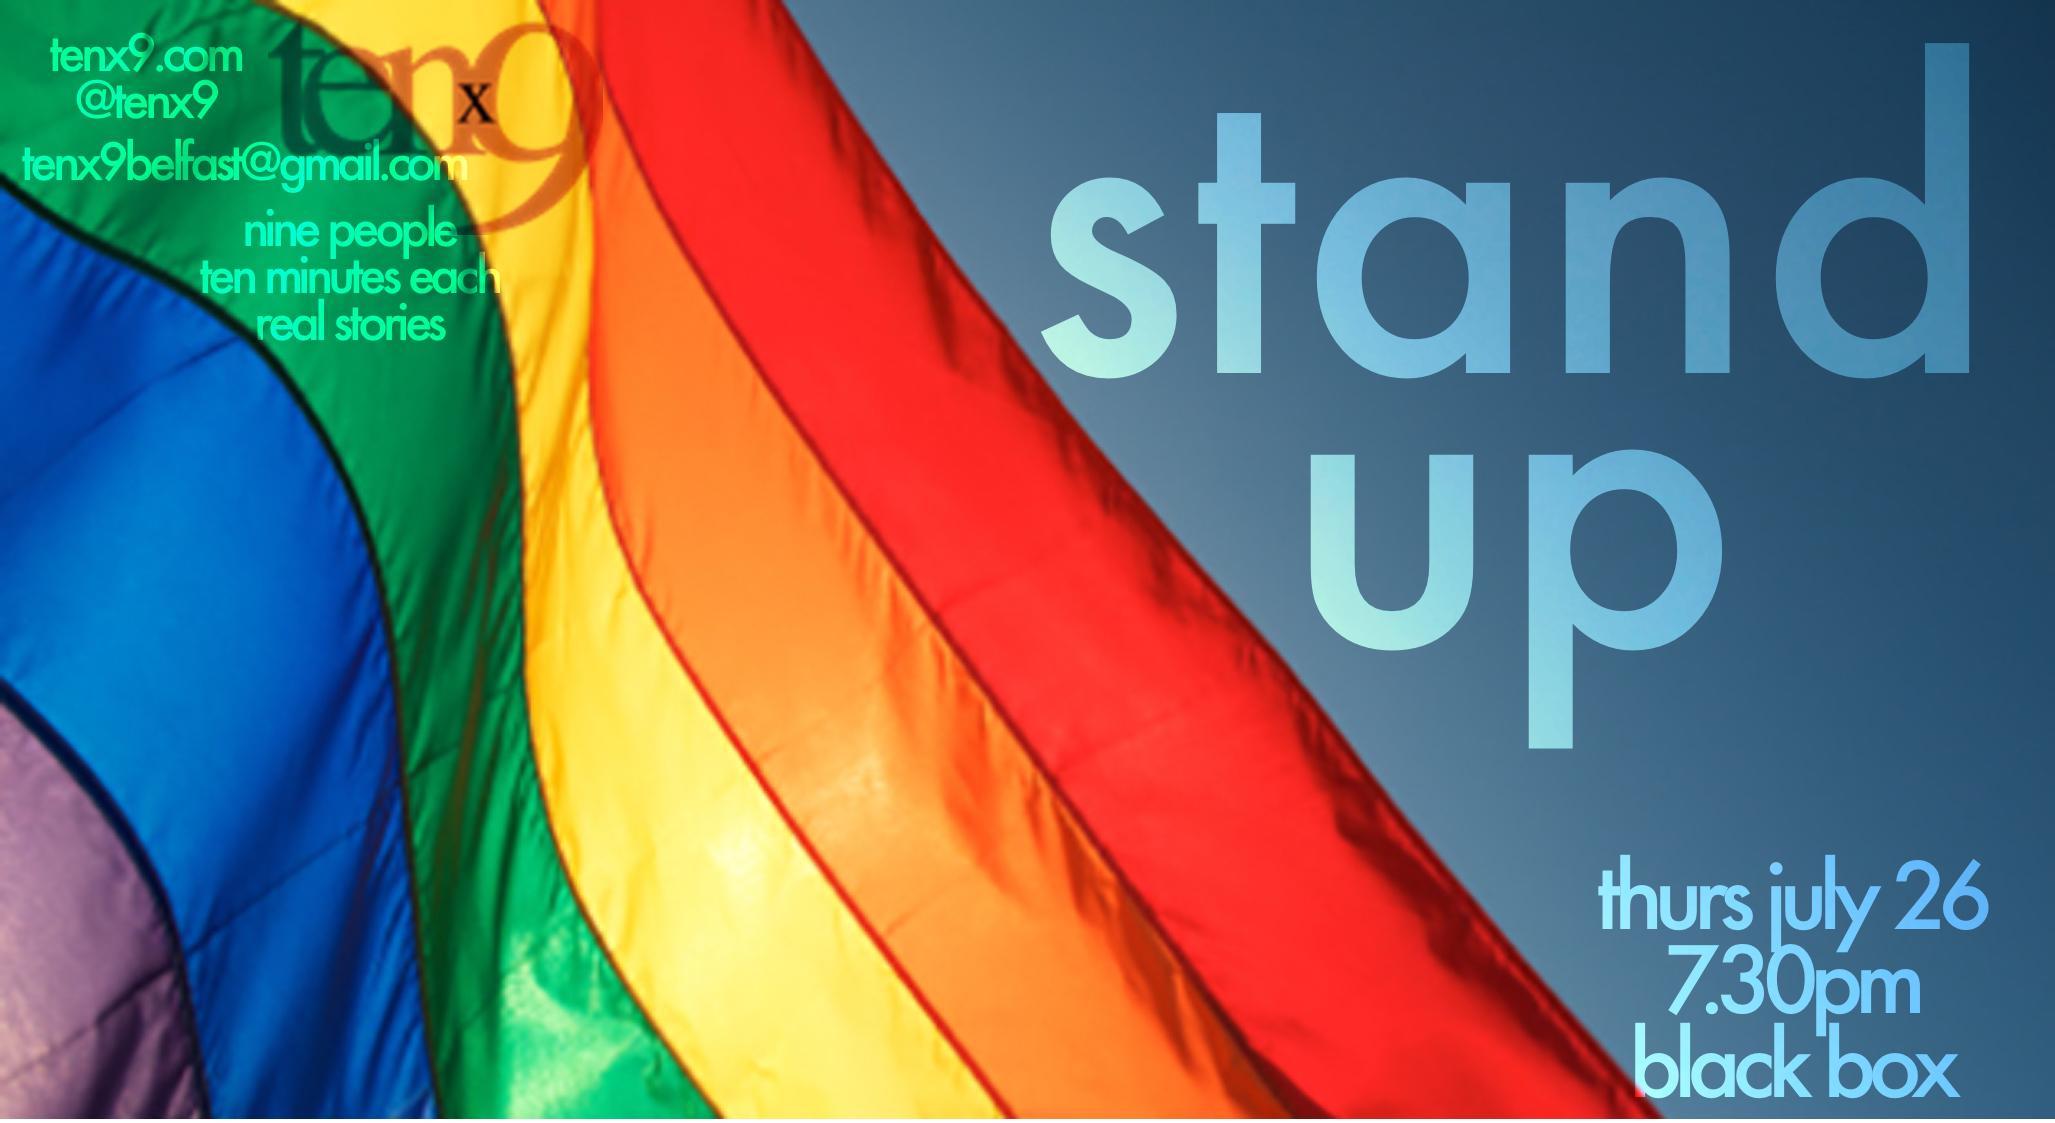 Tenx9 July 26 2018 Stand Up Pride.jpg